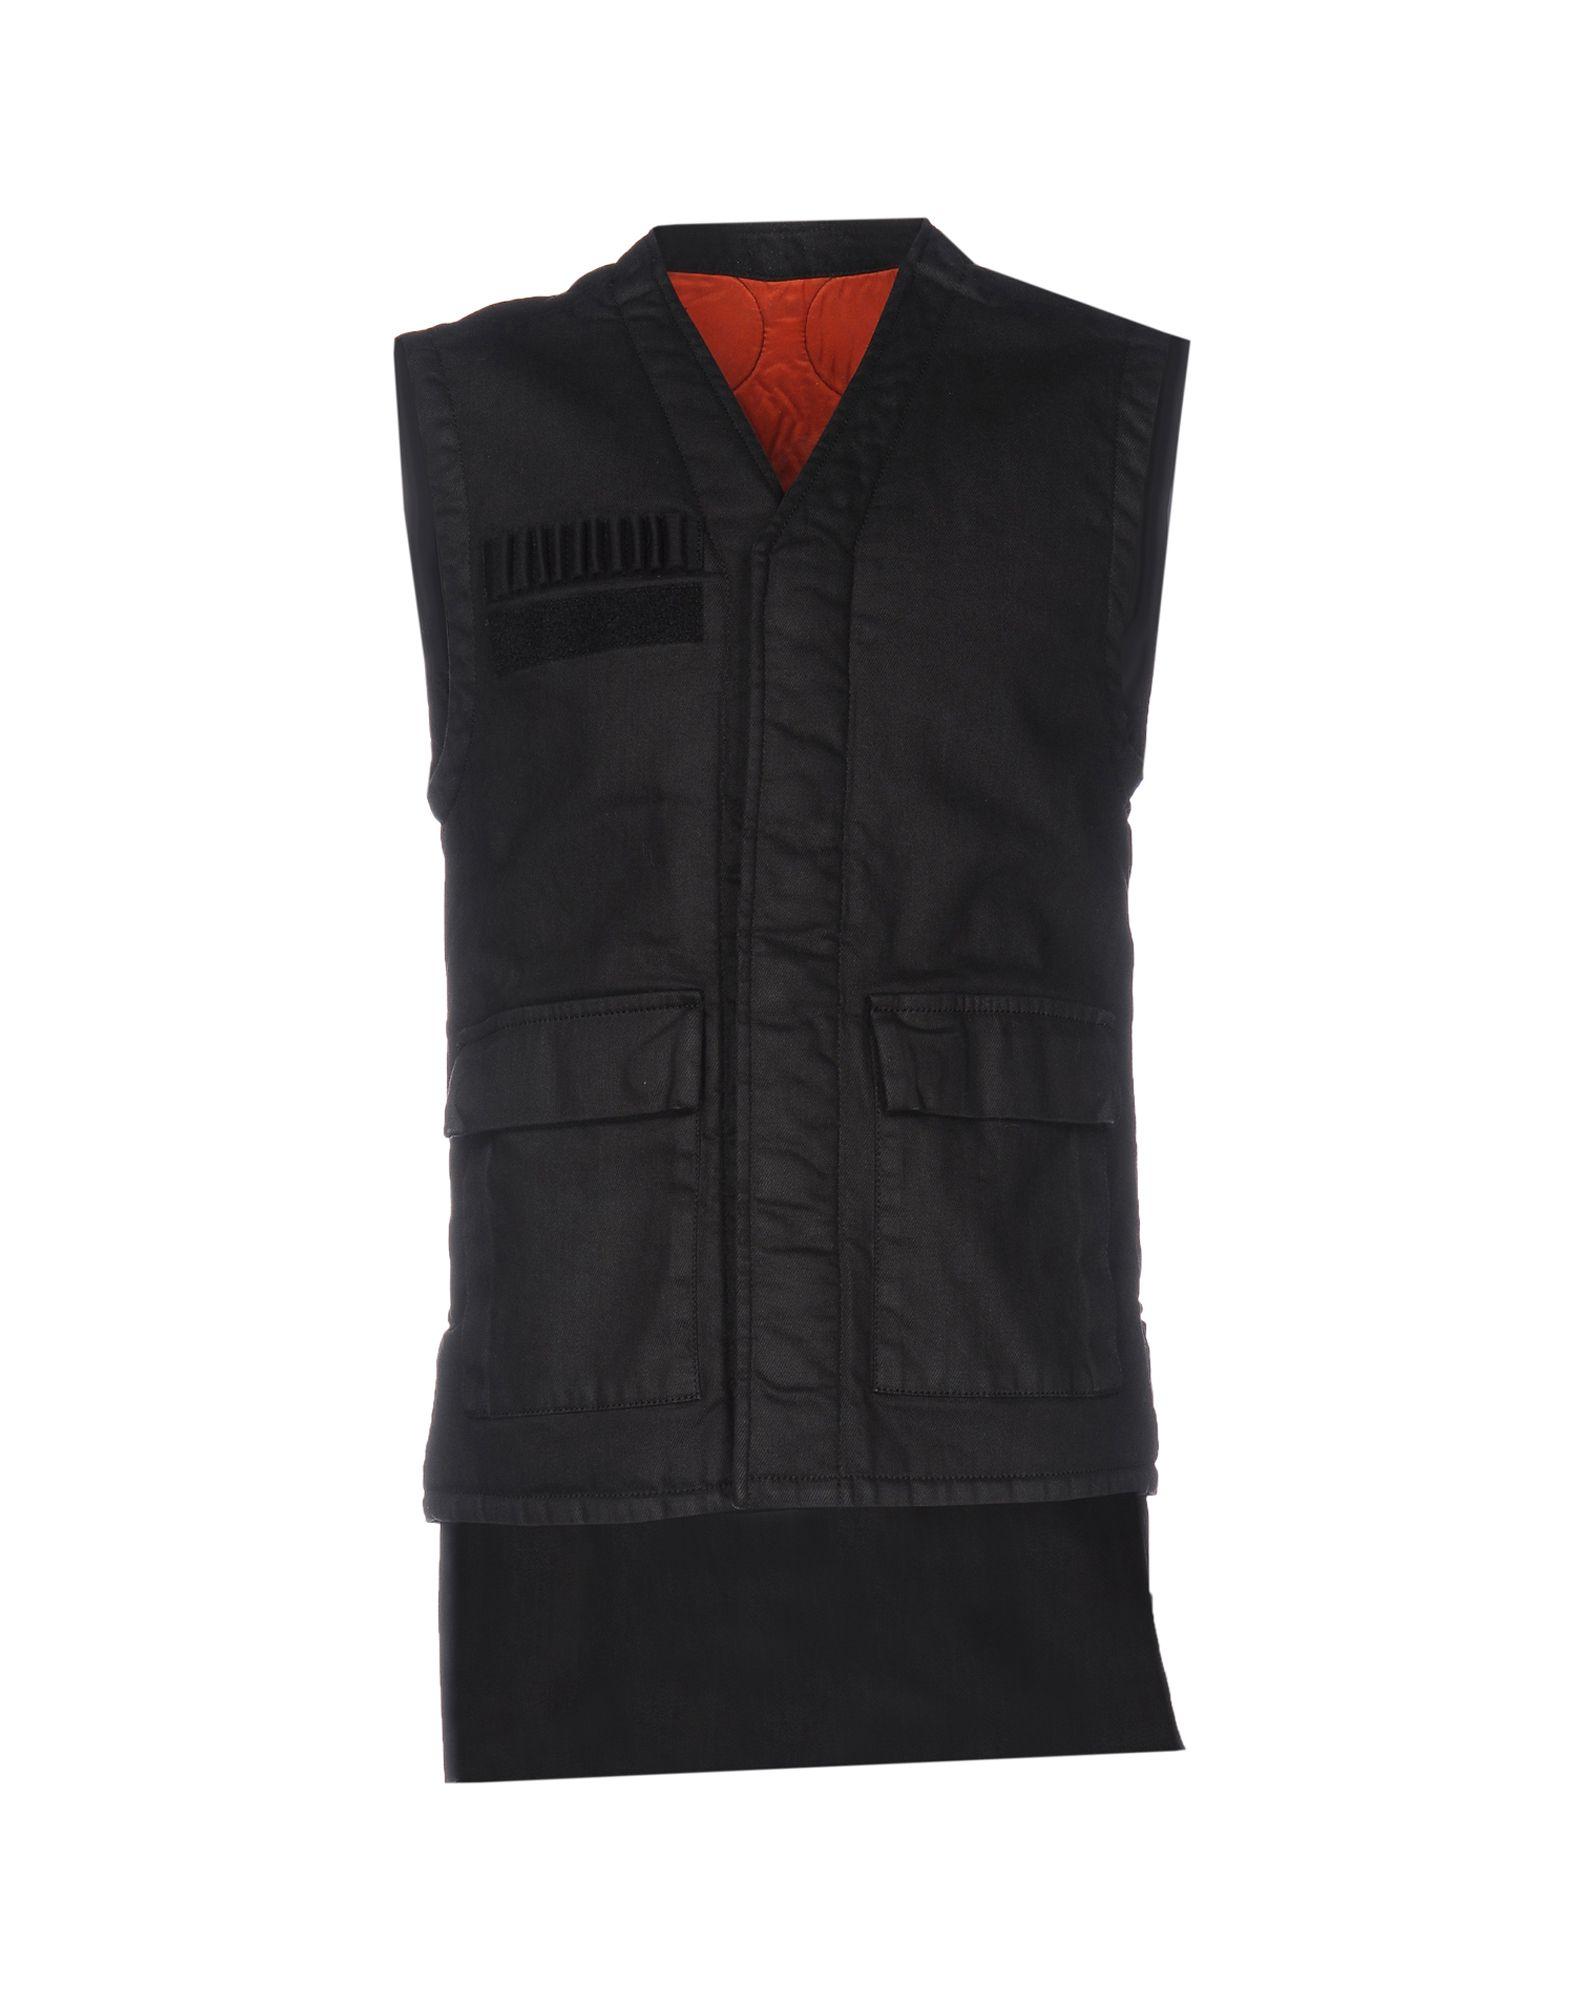 RING Jacket in Black